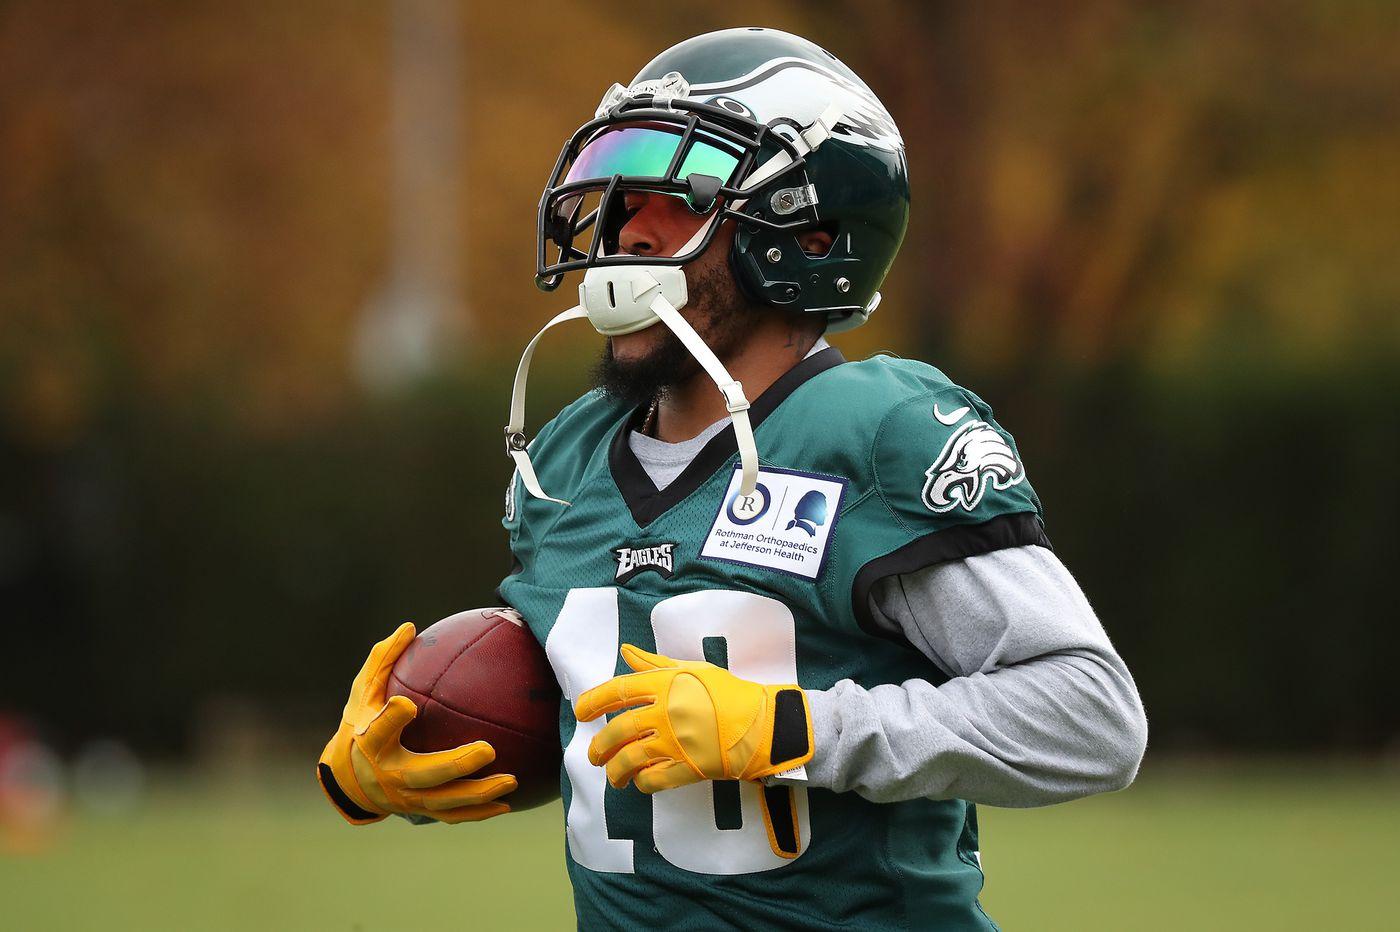 Eagles' Doug Pederson 'optimistic' DeSean Jackson will play Sunday